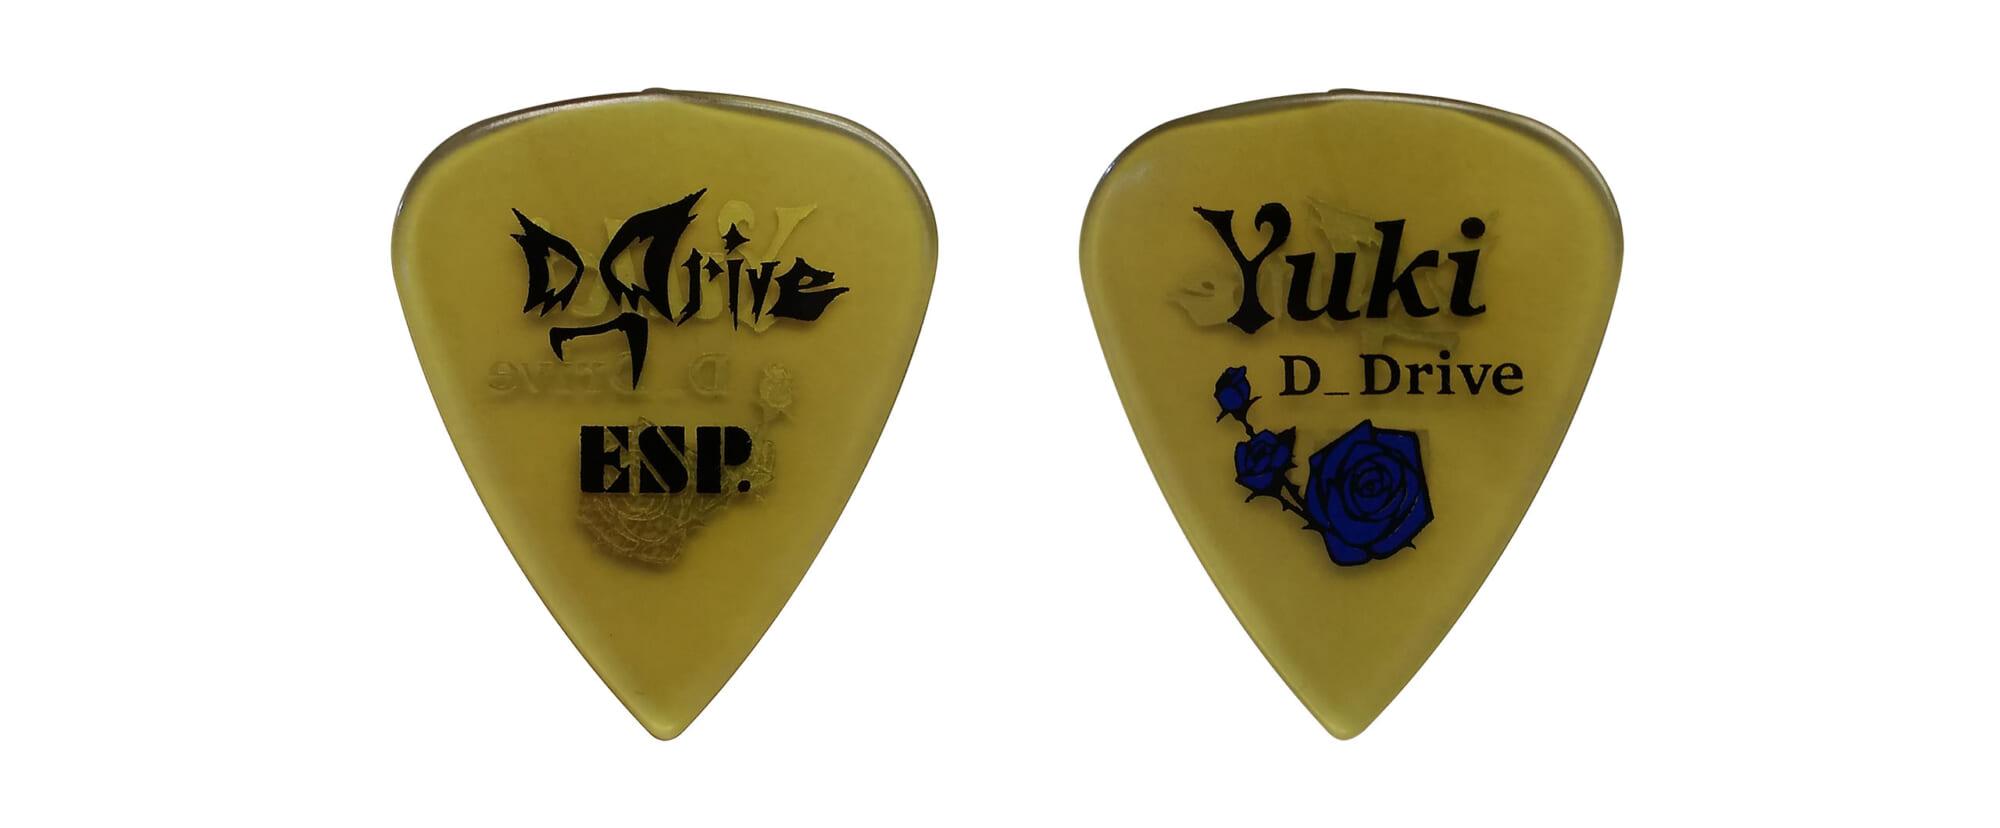 Yuki(D_Drive)のシグネチャー・ピック第2弾がESPより発売